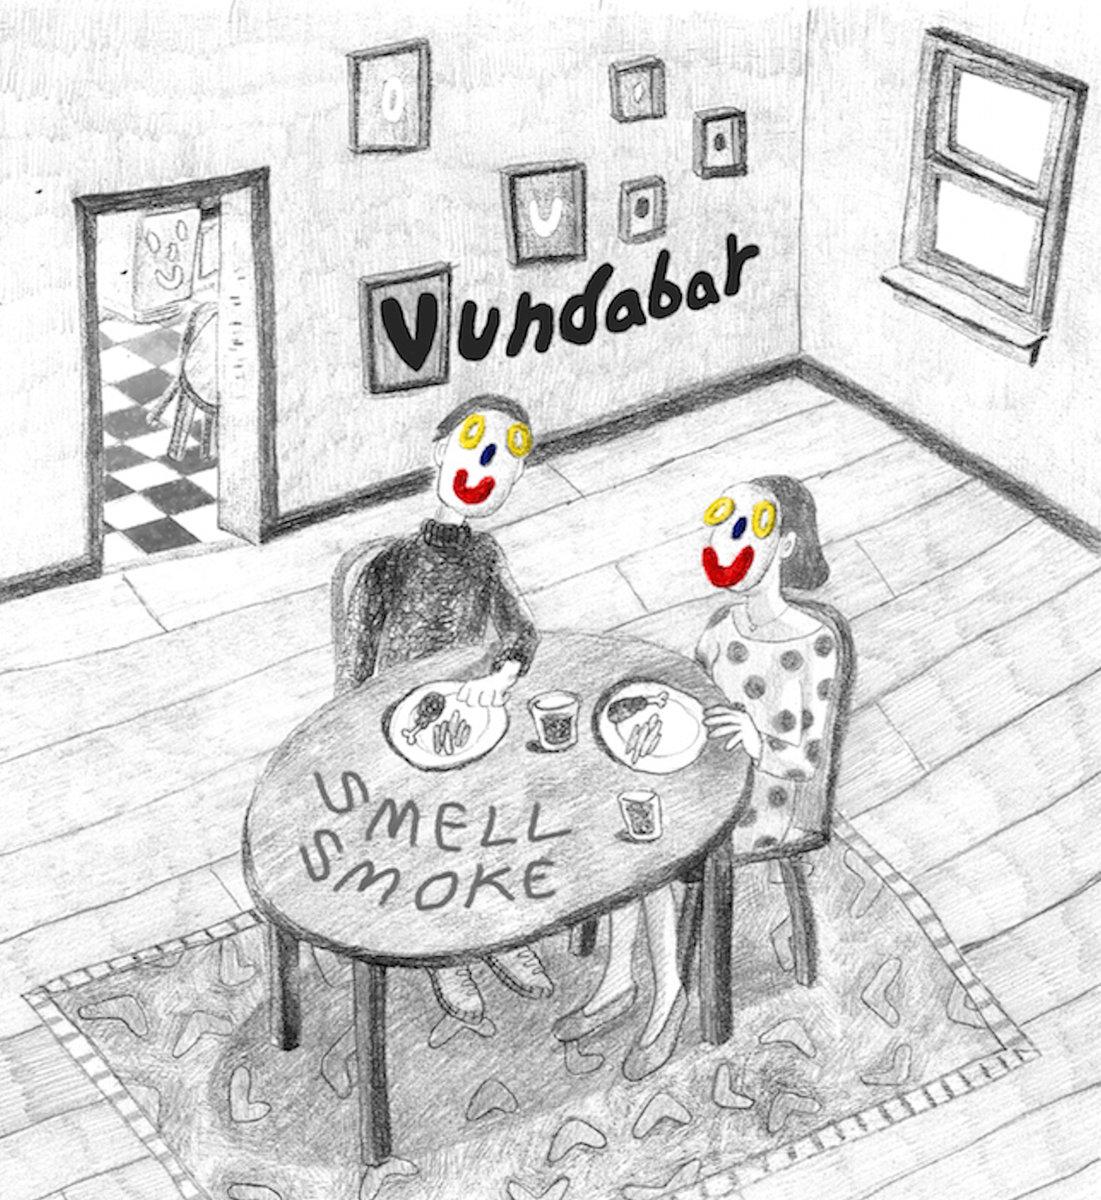 Vundabar - Smell Smoke Album Cover.jpg